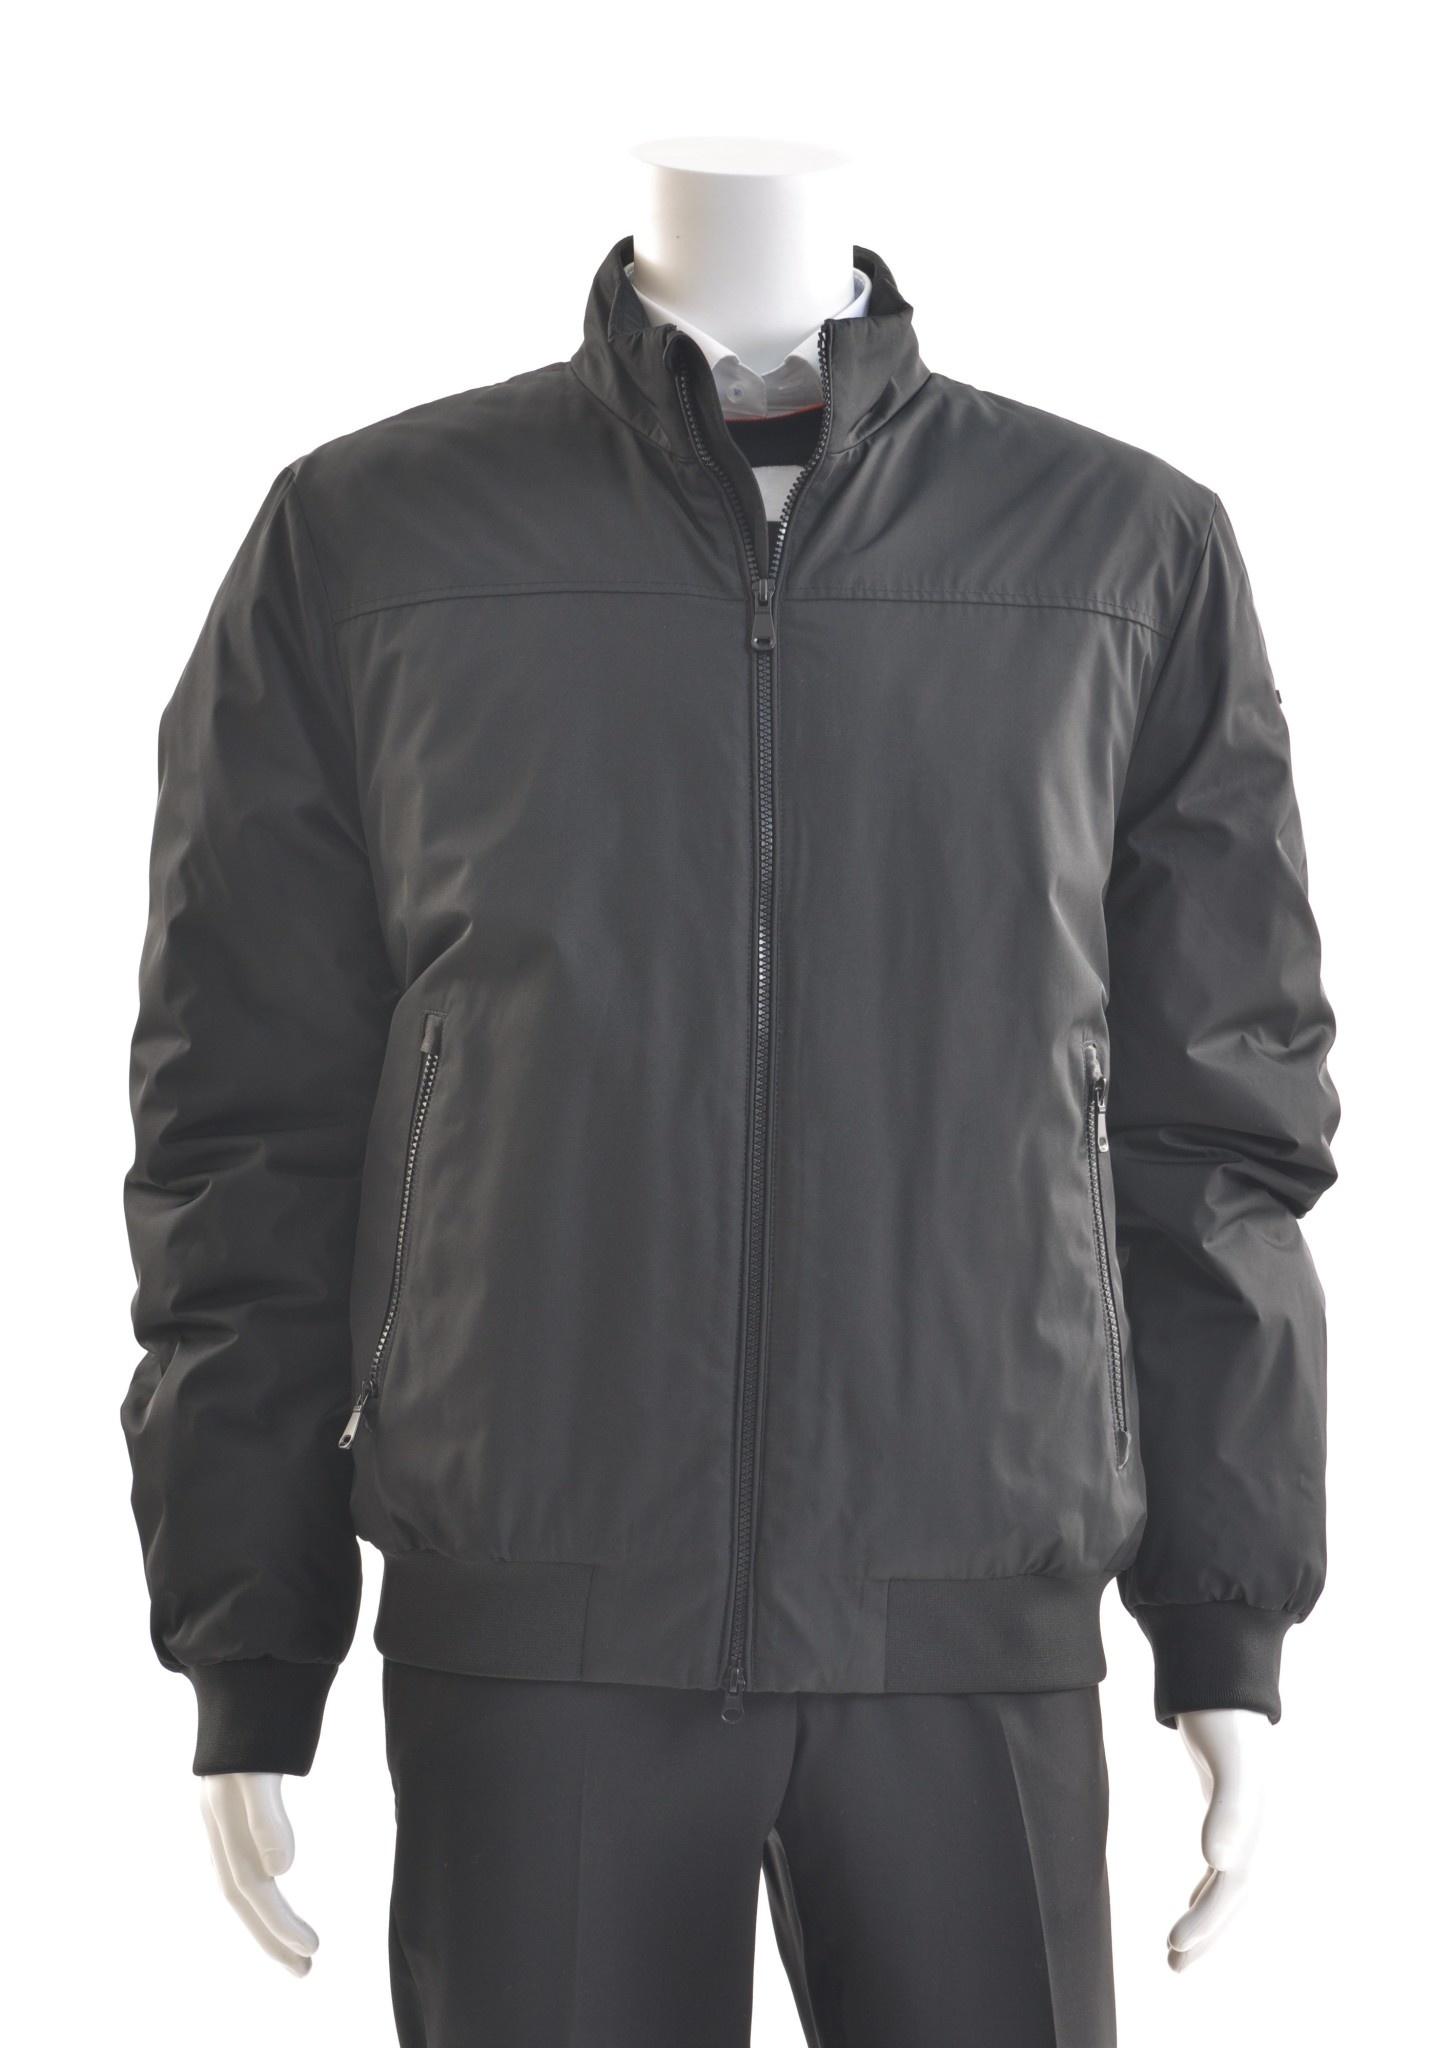 Mobilitare Riconoscimento Adempiere  Vincit Bomber Jacket - Benjamin's Menswear